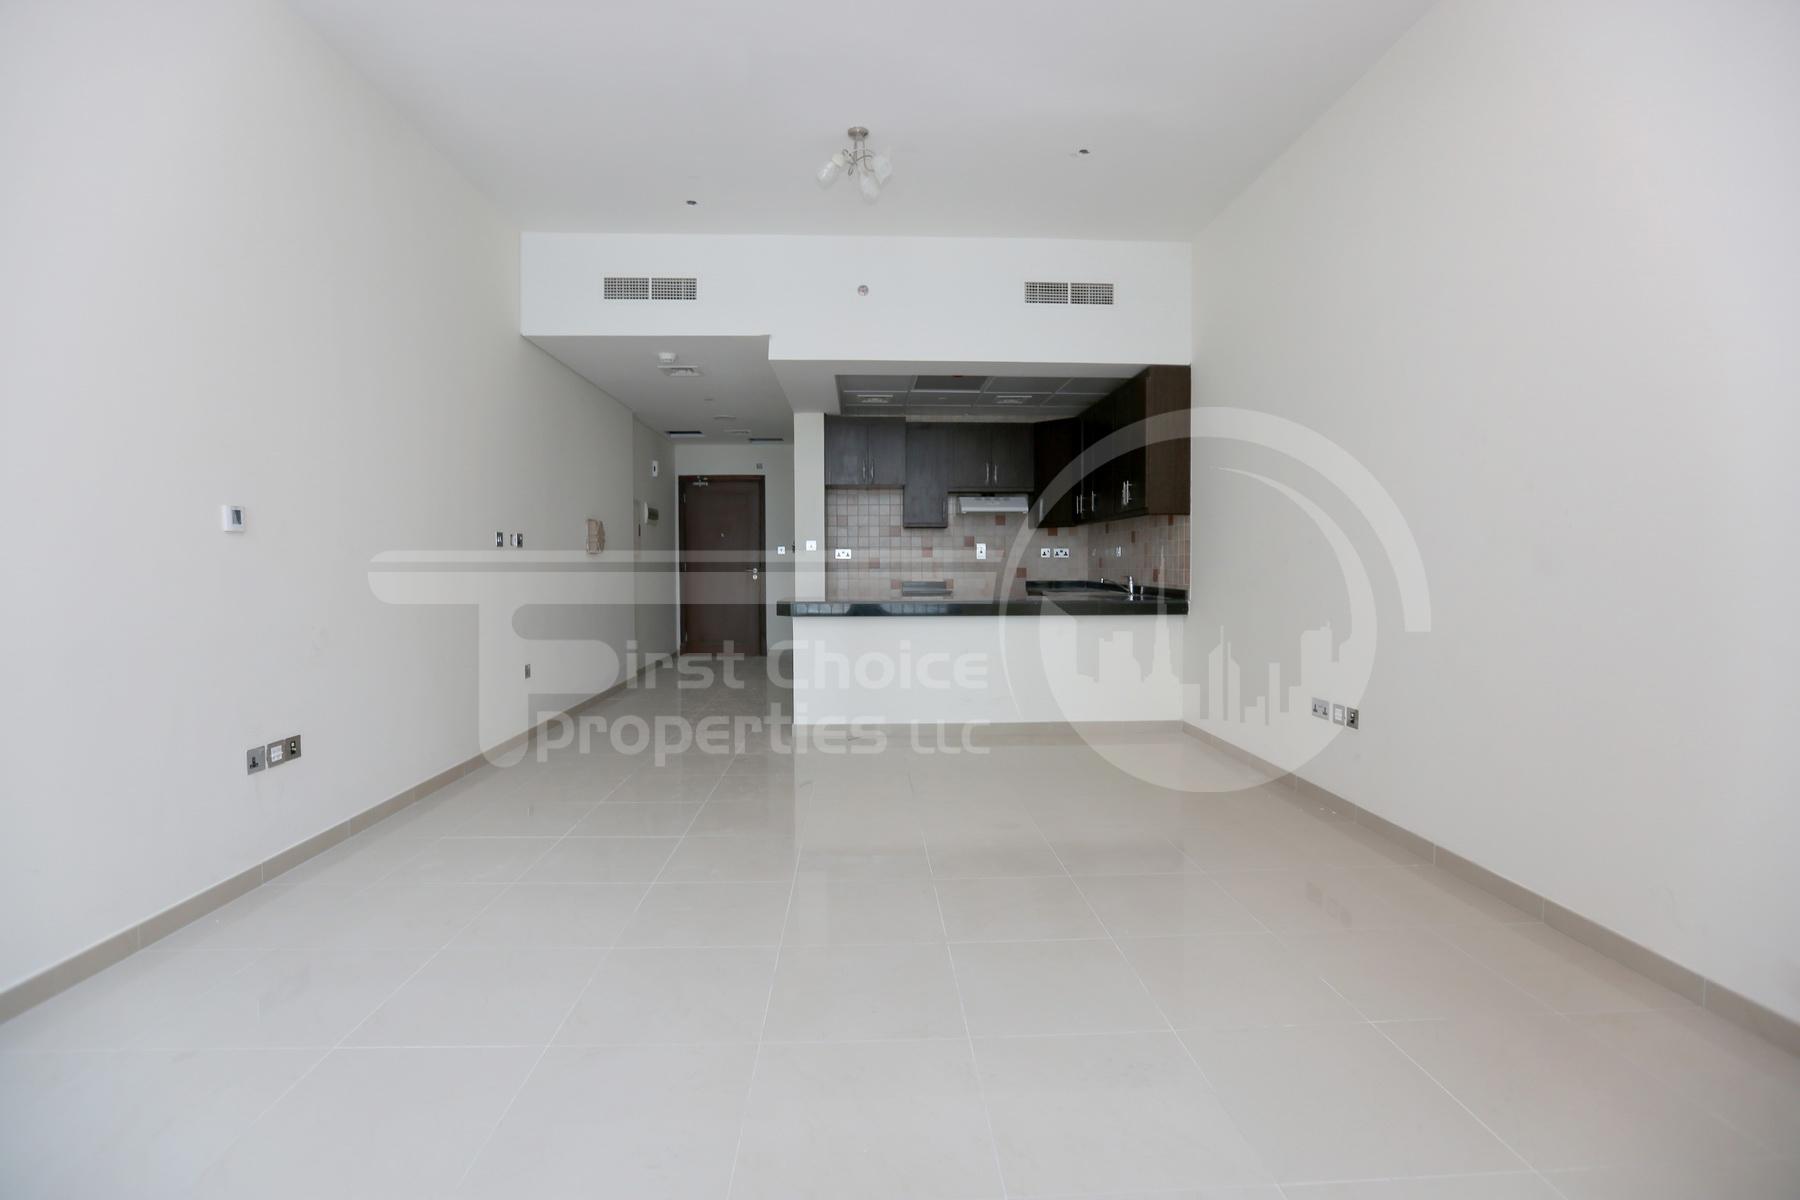 Studio Apartment - Abu Dhabi - UAE - Al Reem Island - Hydra Avenue (1).JPG